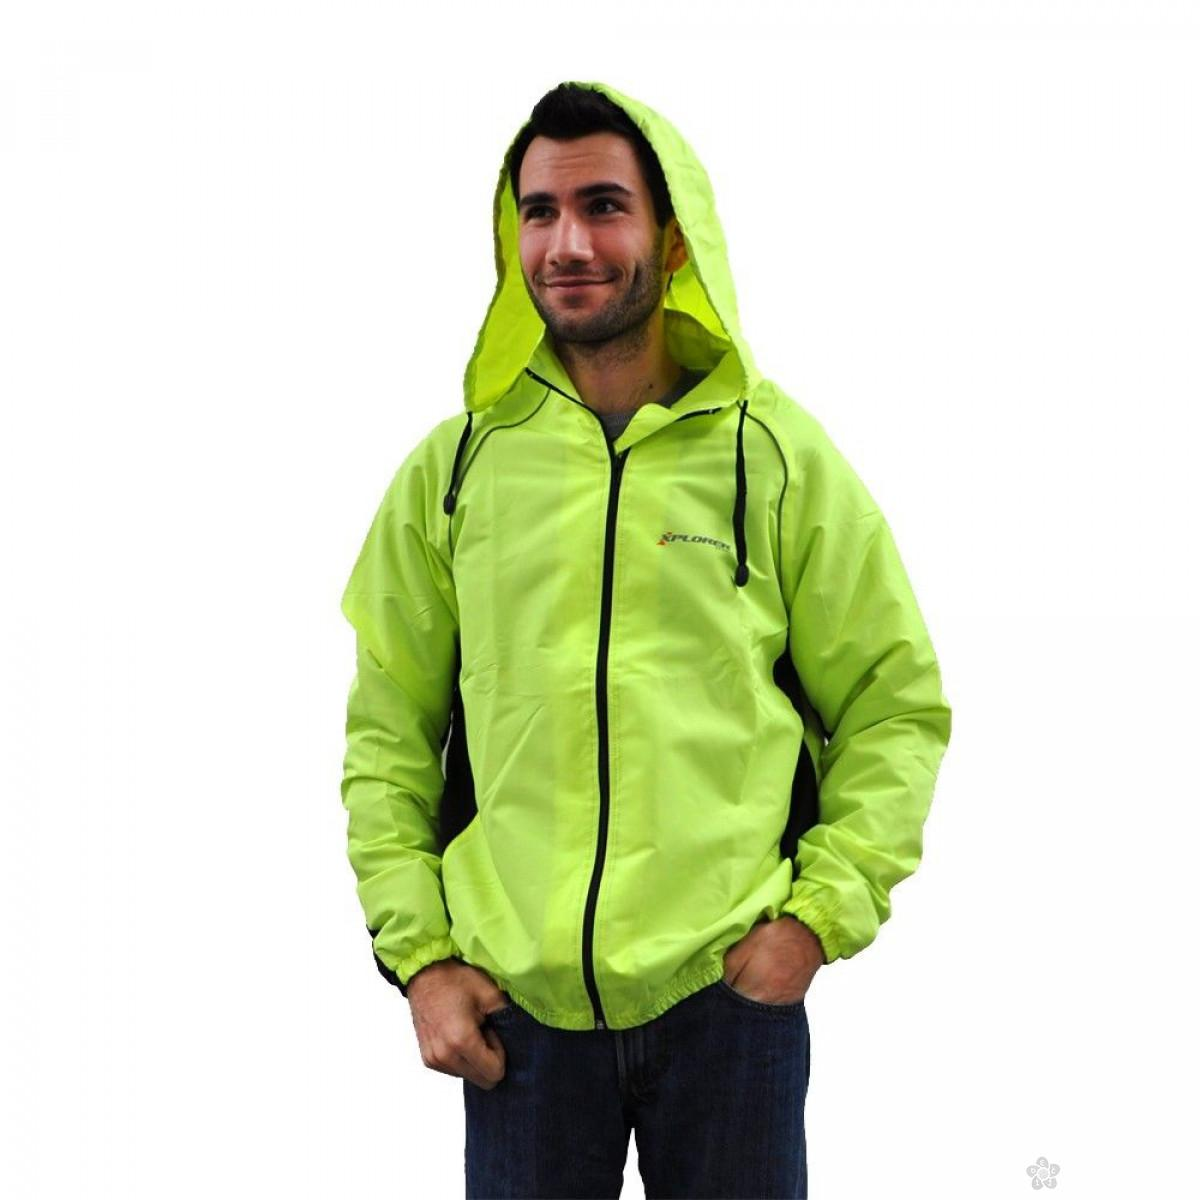 Biciklistička jakna Xplorer Mistral vel. XL